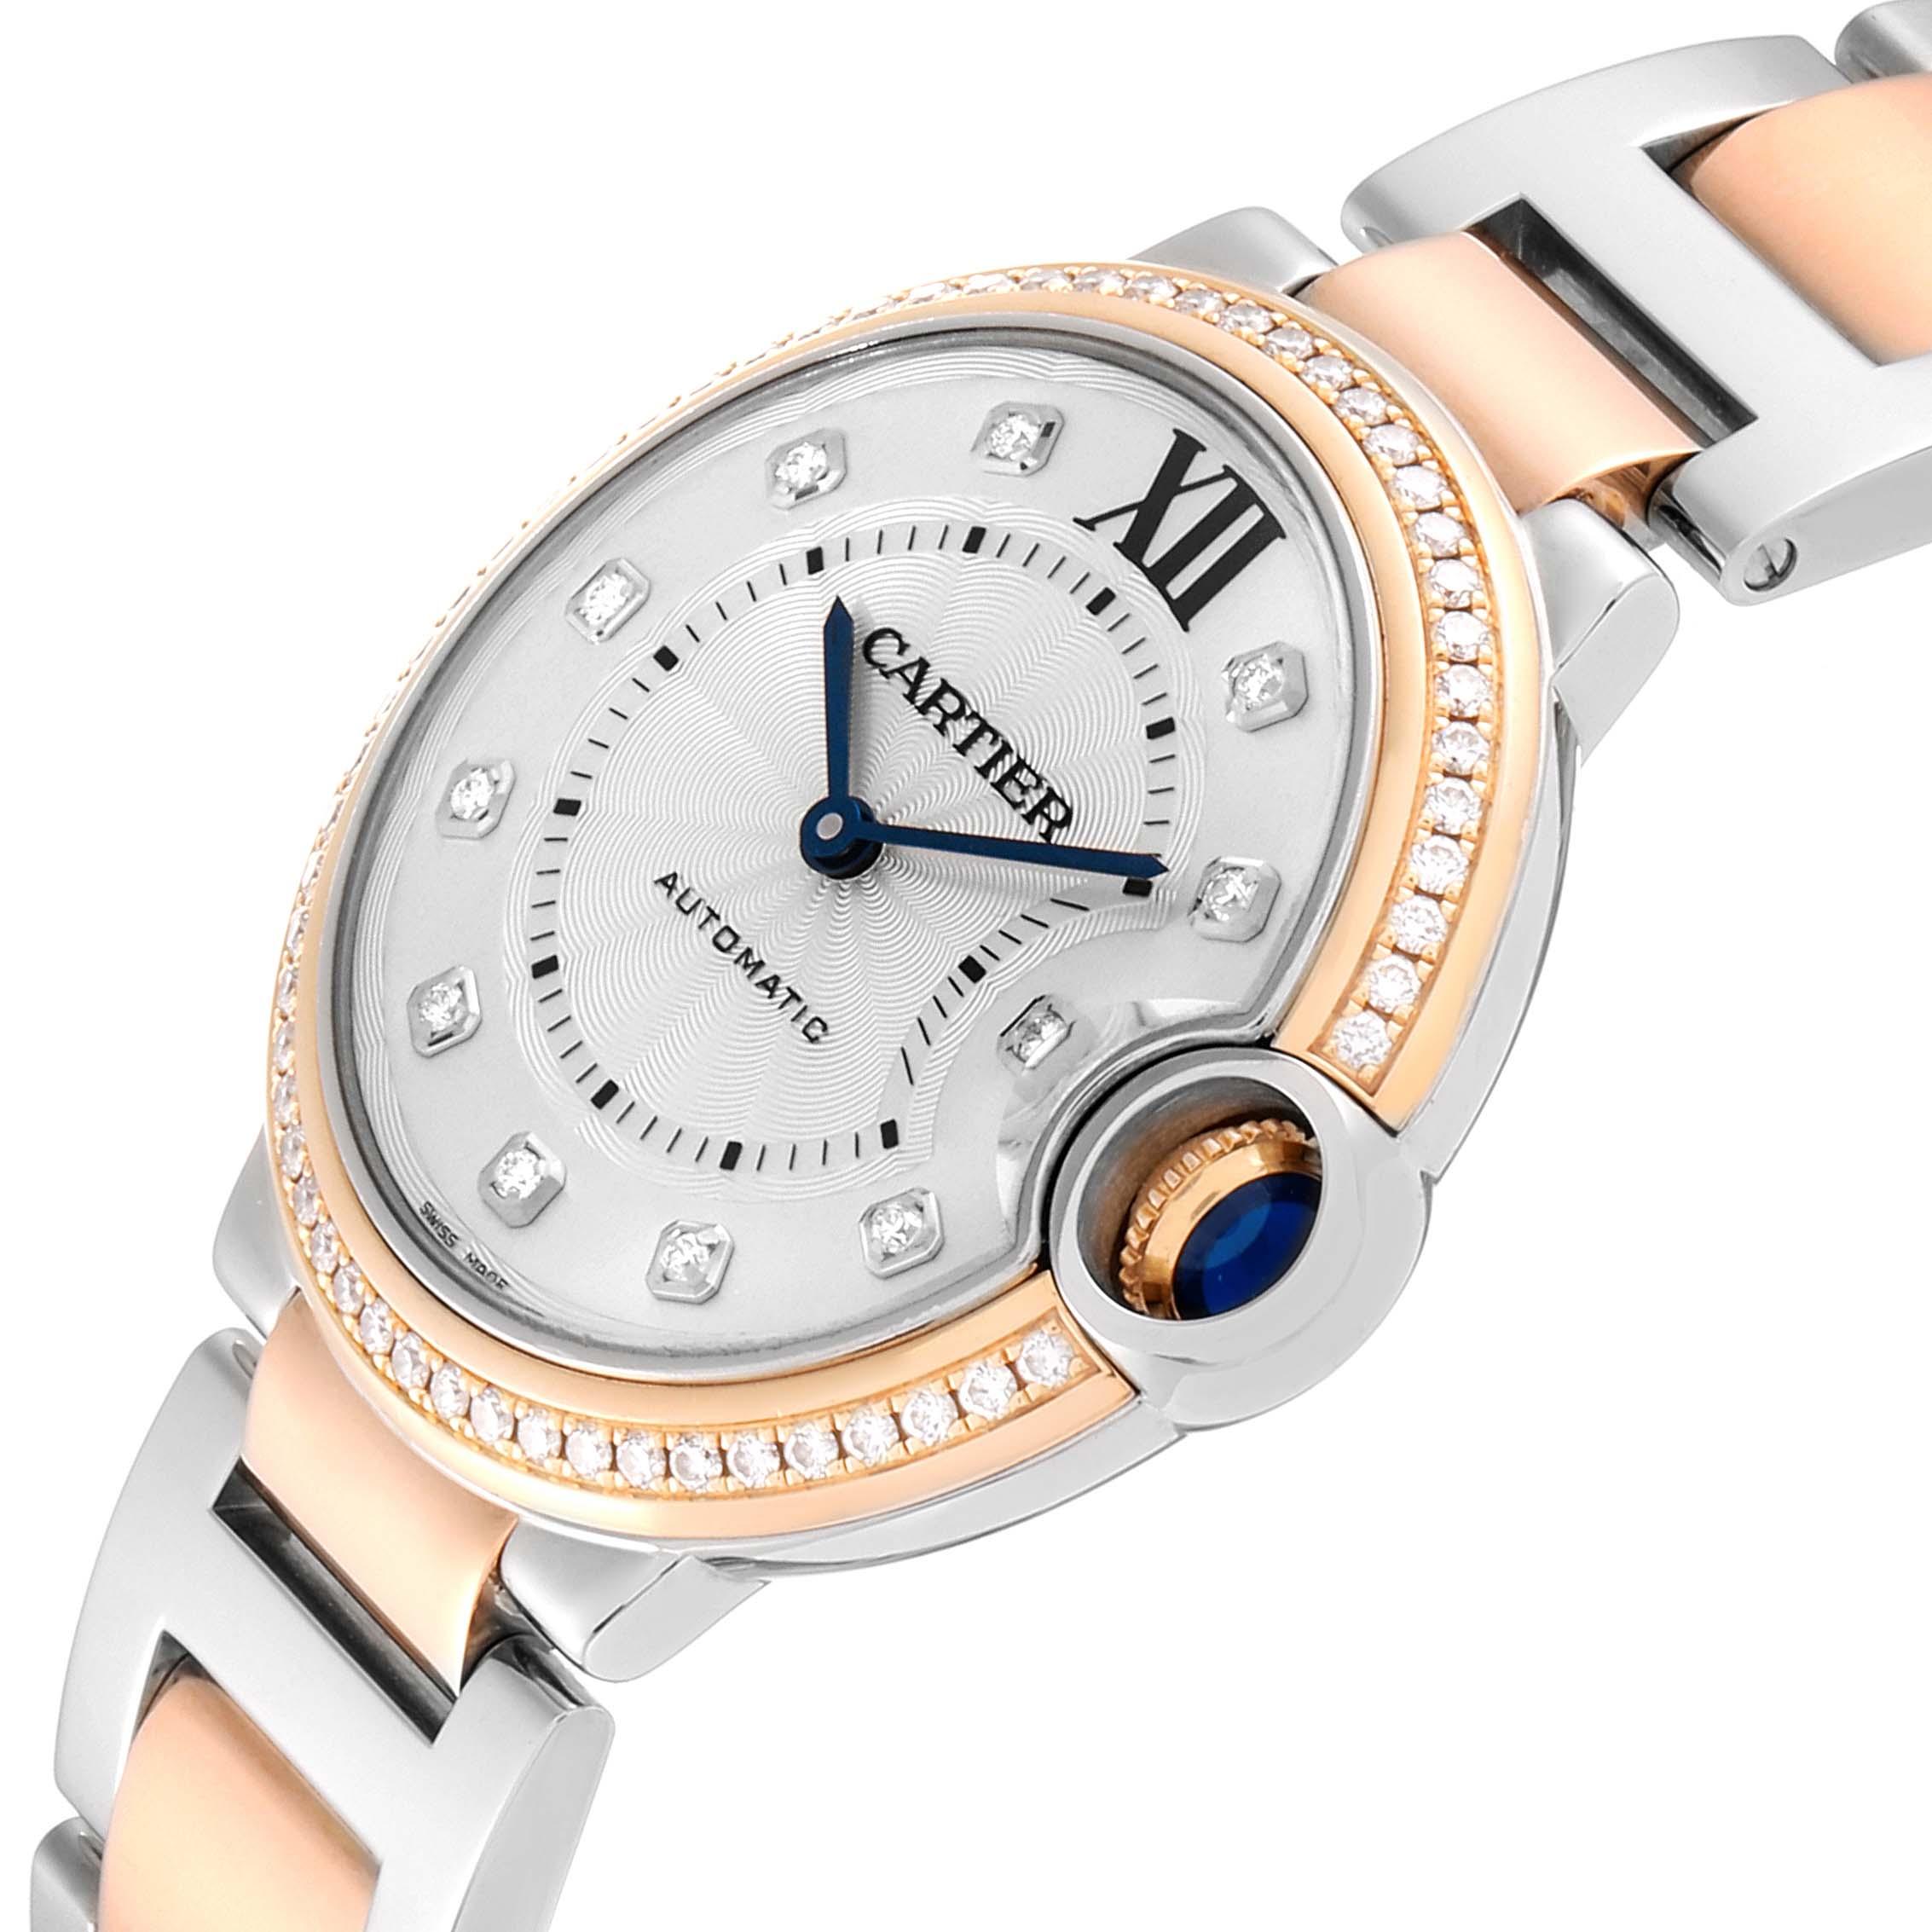 Cartier Ballon Blue Steel Rose Gold Diamond Ladies Watch WE902078 Box Papers SwissWatchExpo